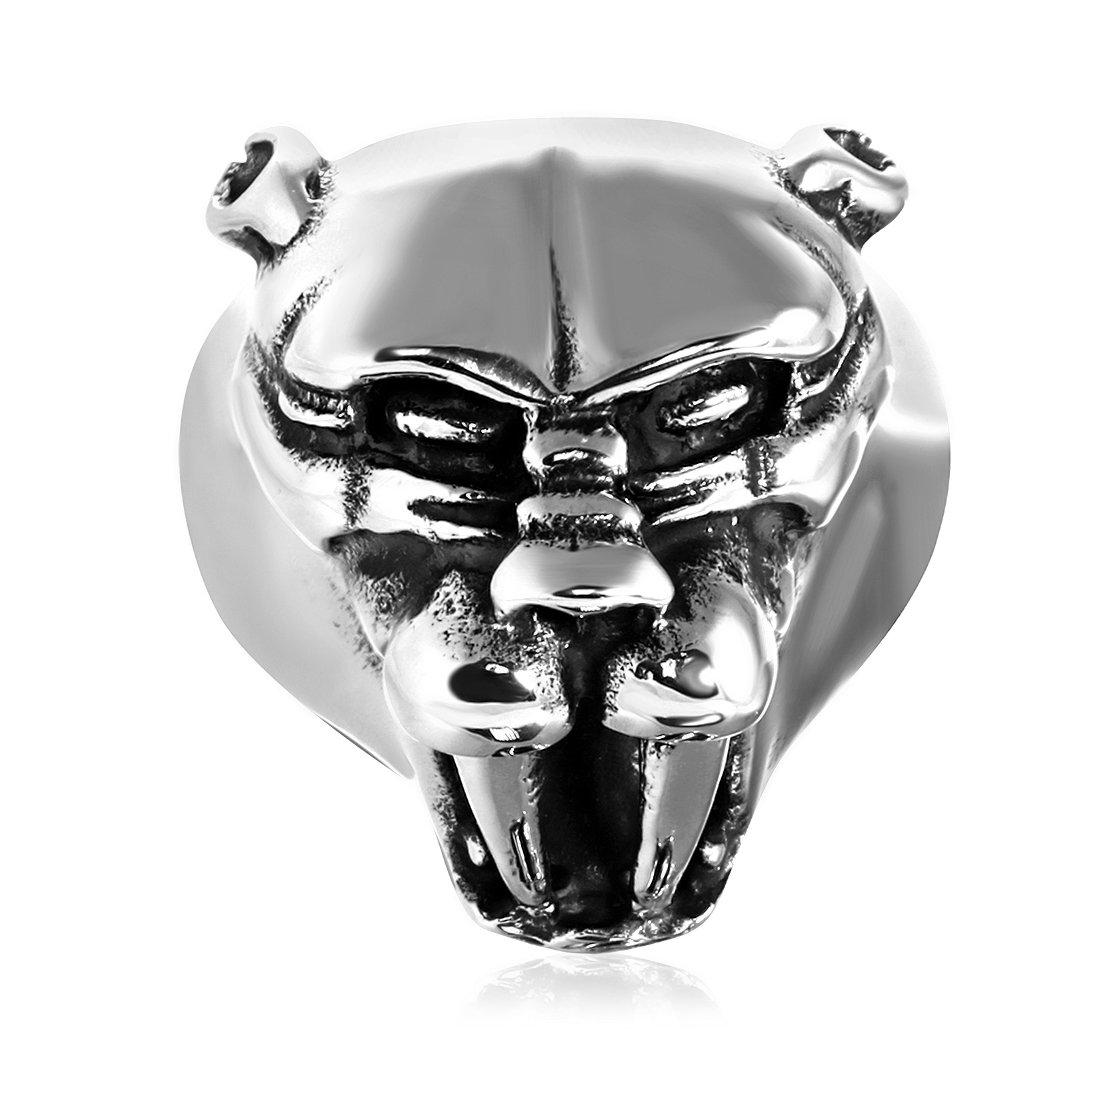 Stainless Steel 2 Color Long Fanged Demon Head Biker Ring